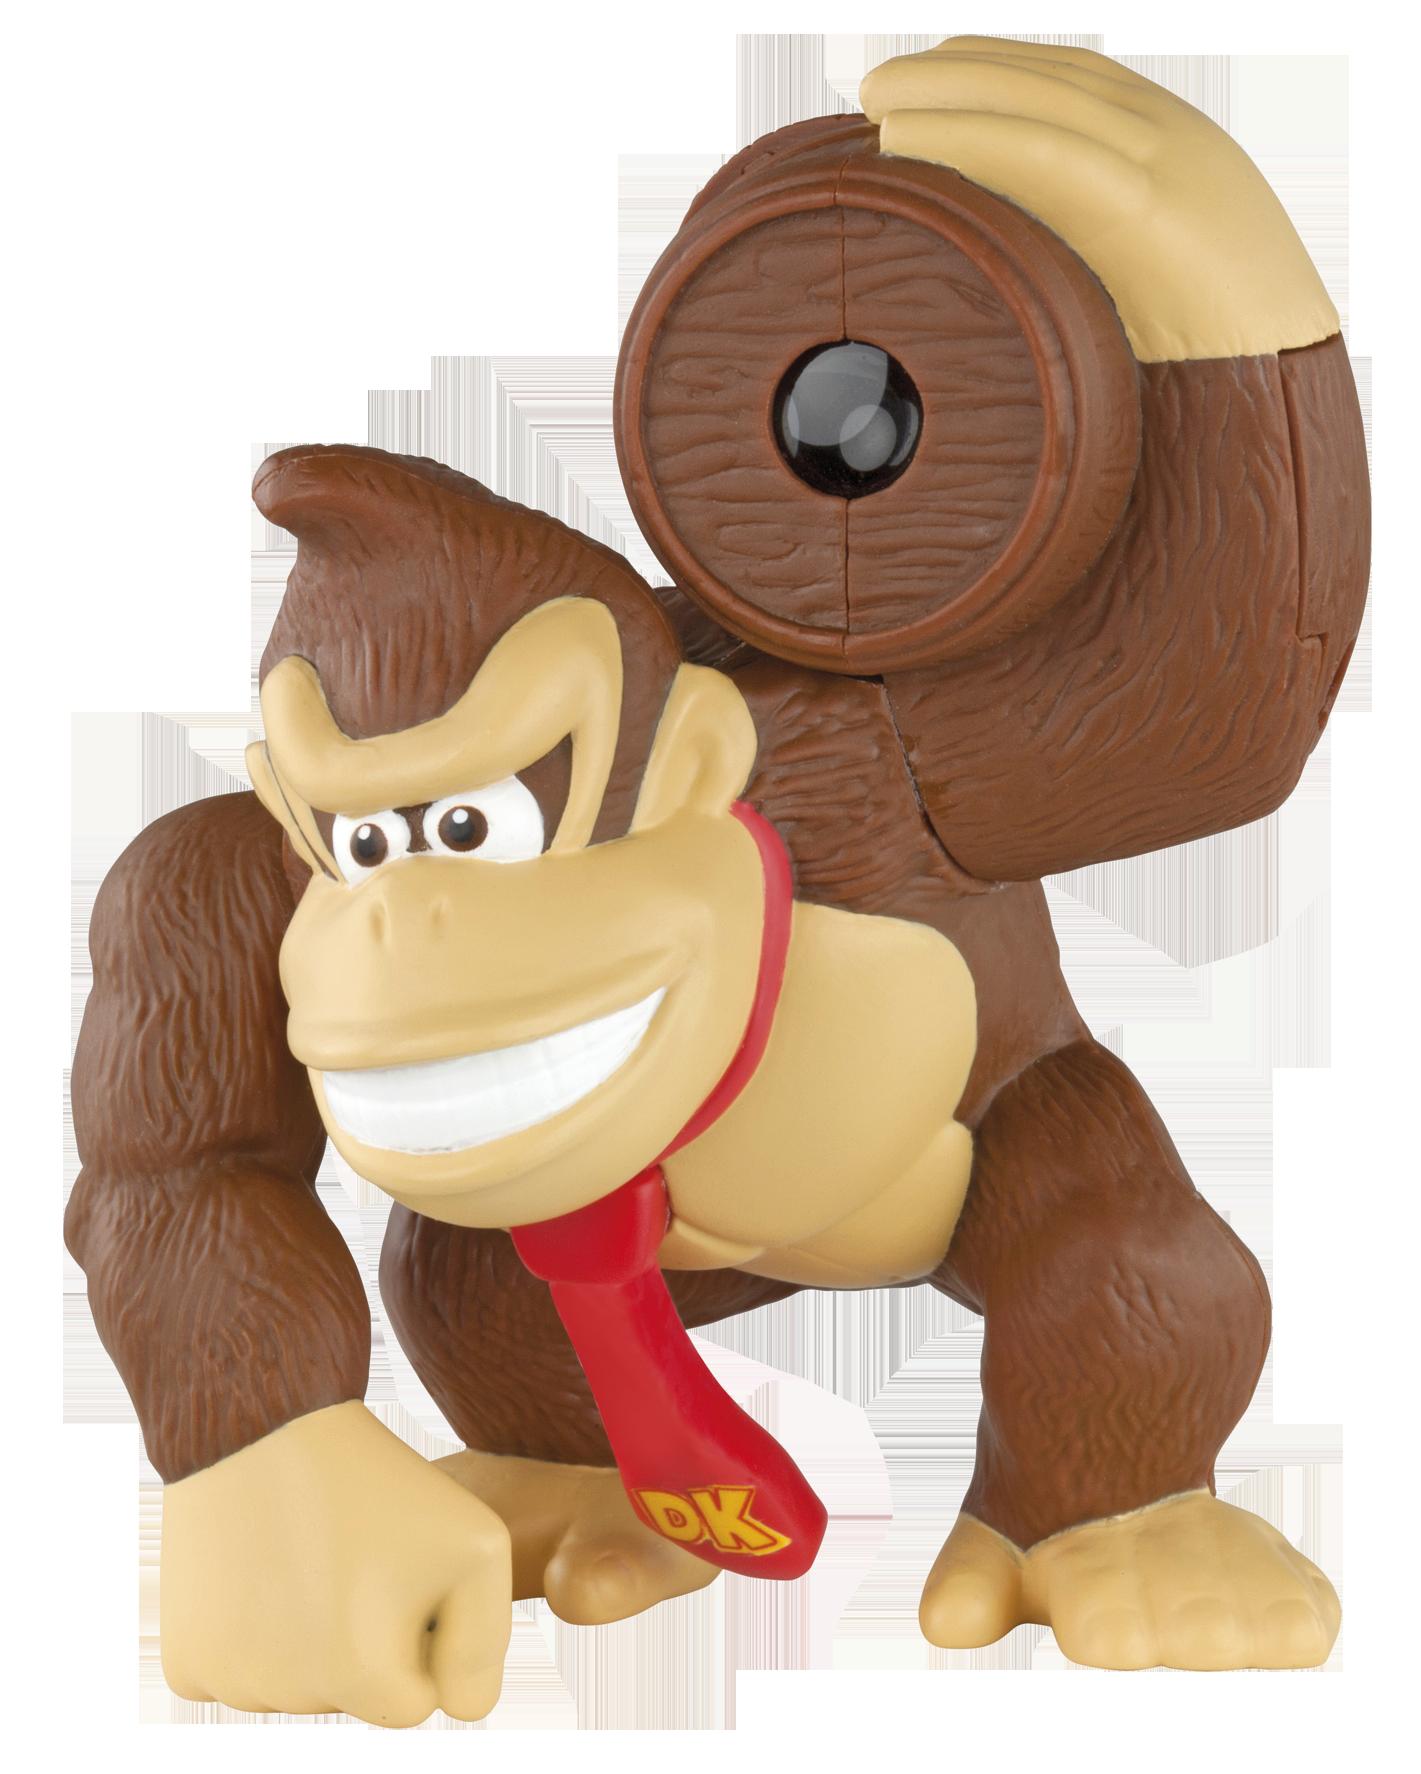 Donkey_Kong-nofx